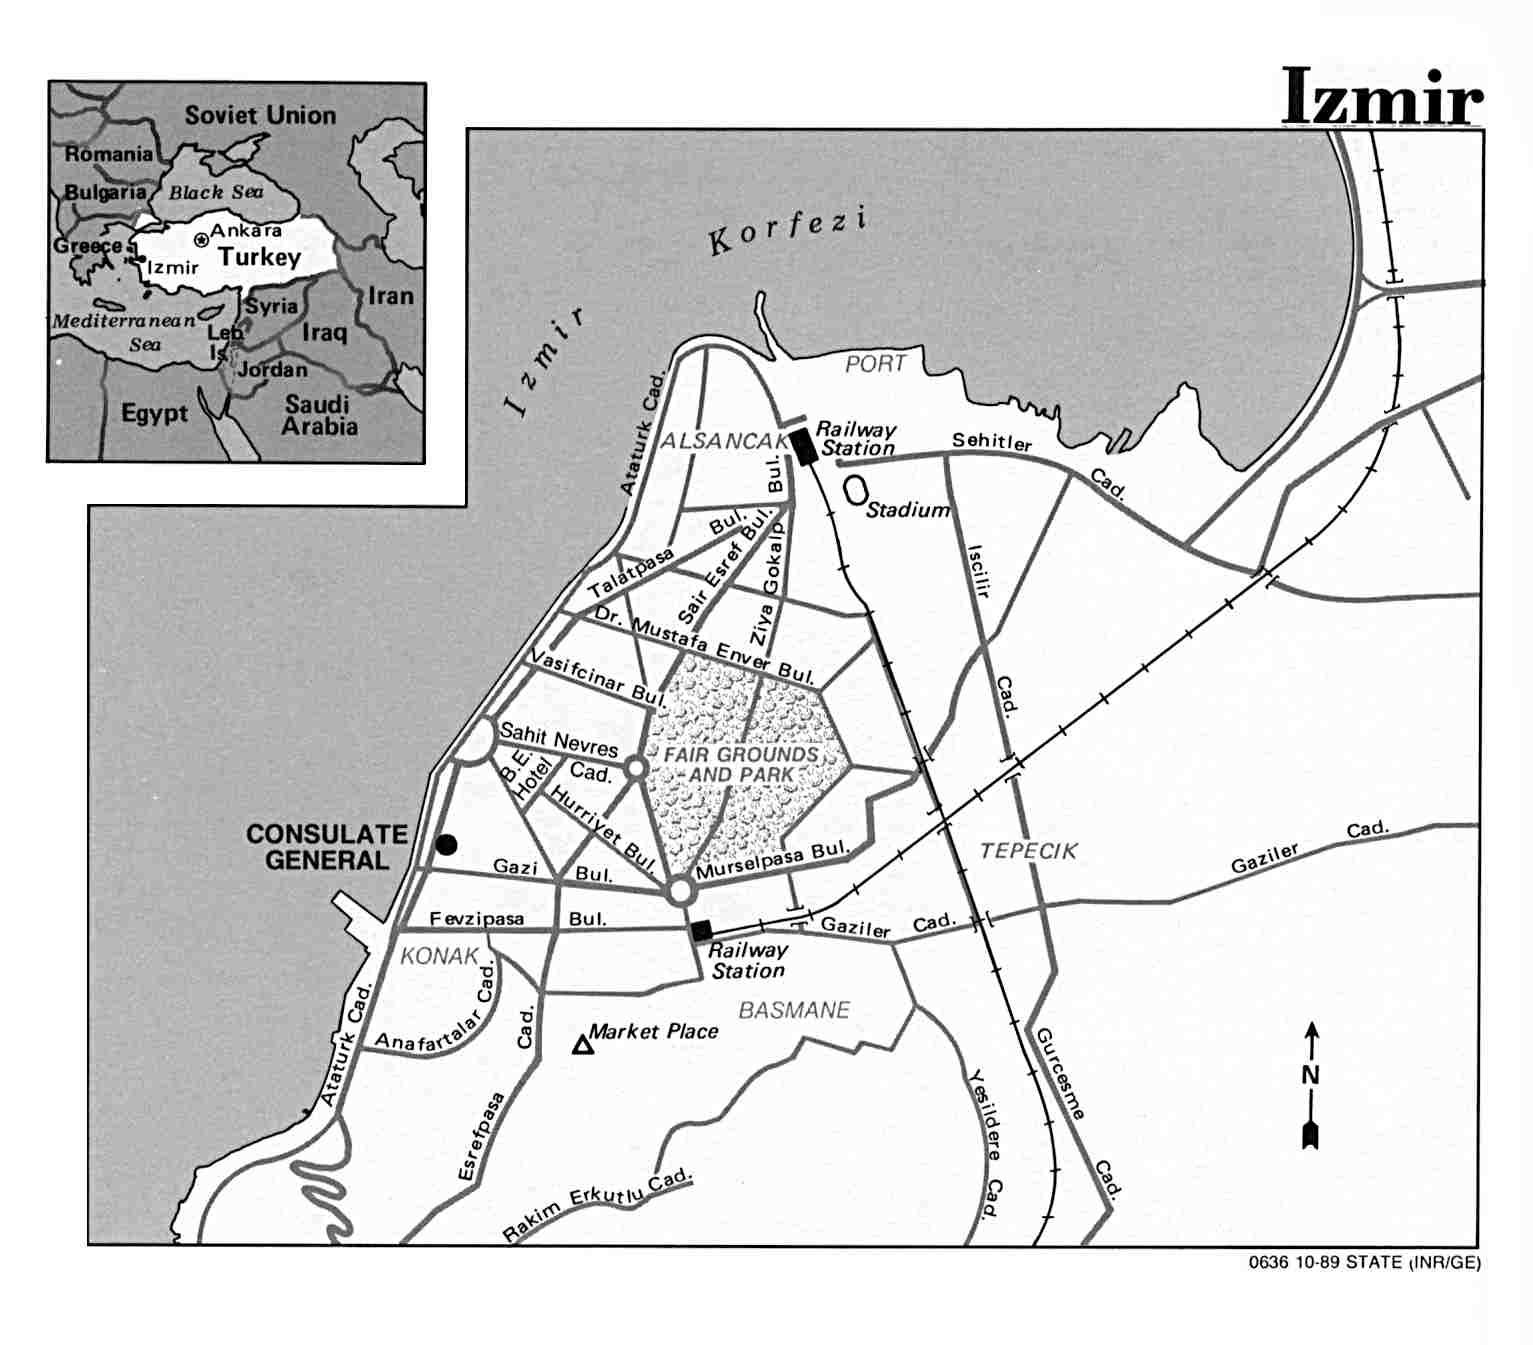 Izmir City Map, Turkey